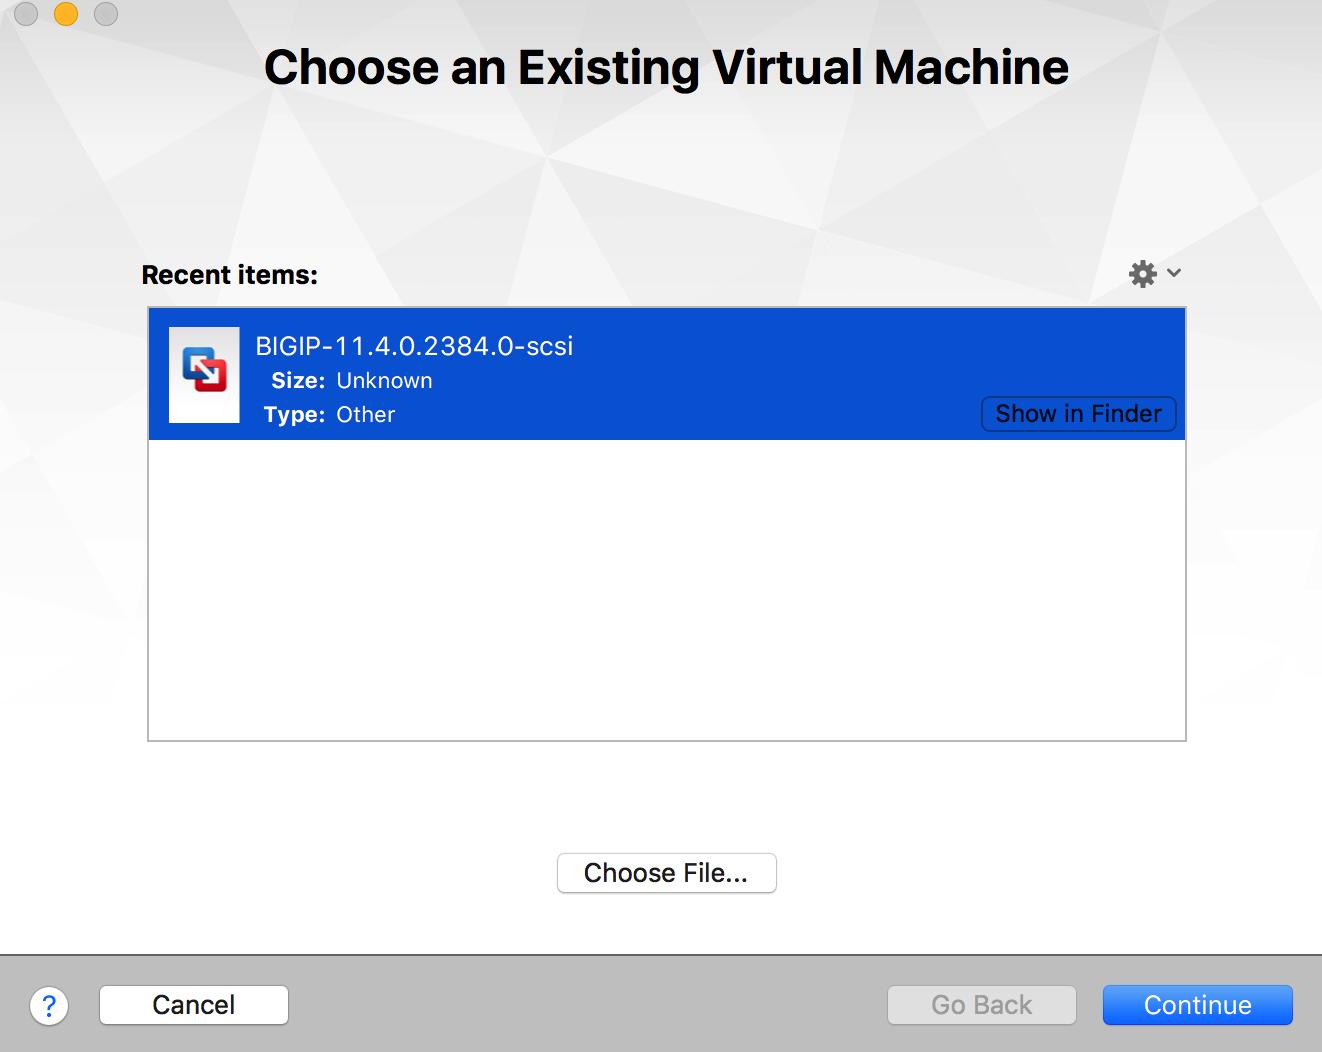 How to setup a F5 BIG-IP LTM Virtual lab on VMware Fusion? - Network